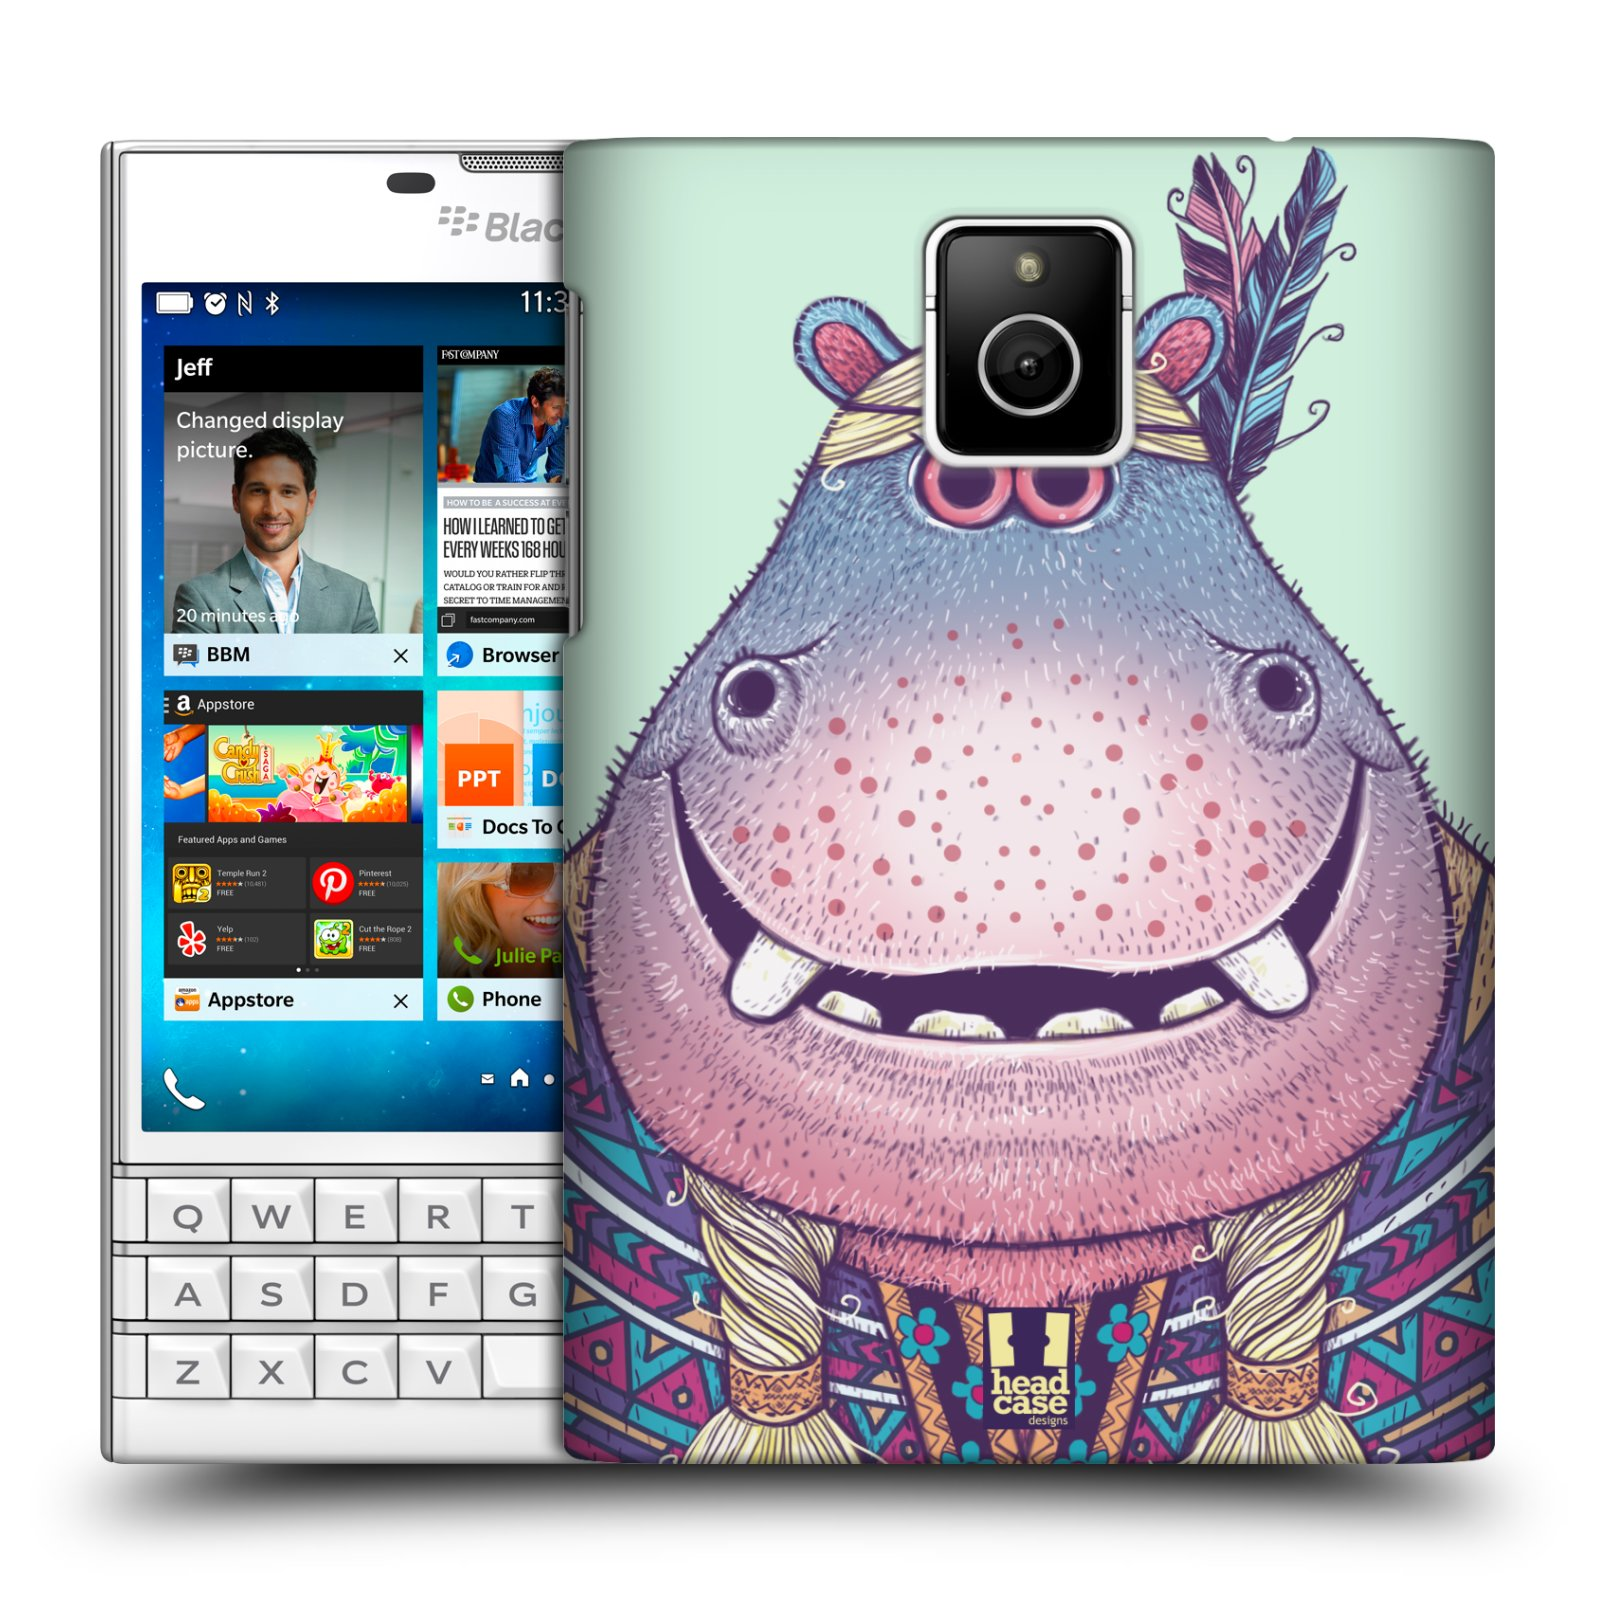 HEAD CASE plastový obal na mobil BlackBerry Passport vzor Kreslená zvířátka hroch